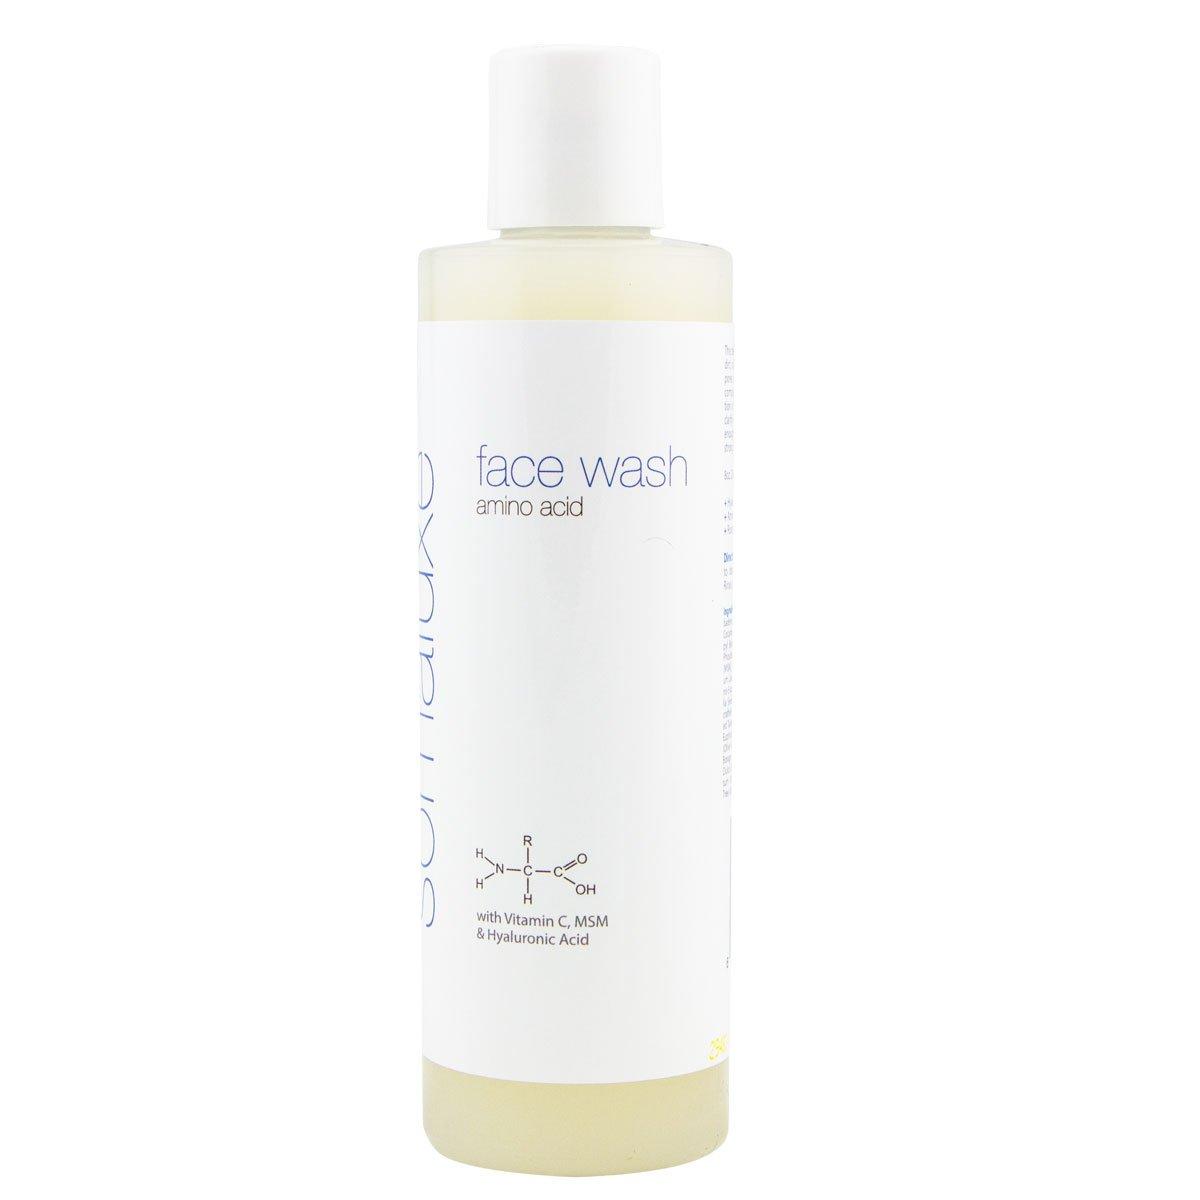 Amino Acid Face Wash for Wrinkles & Skin Damage w/Hyaluronic Acid & Vitamin C by Somaluxe